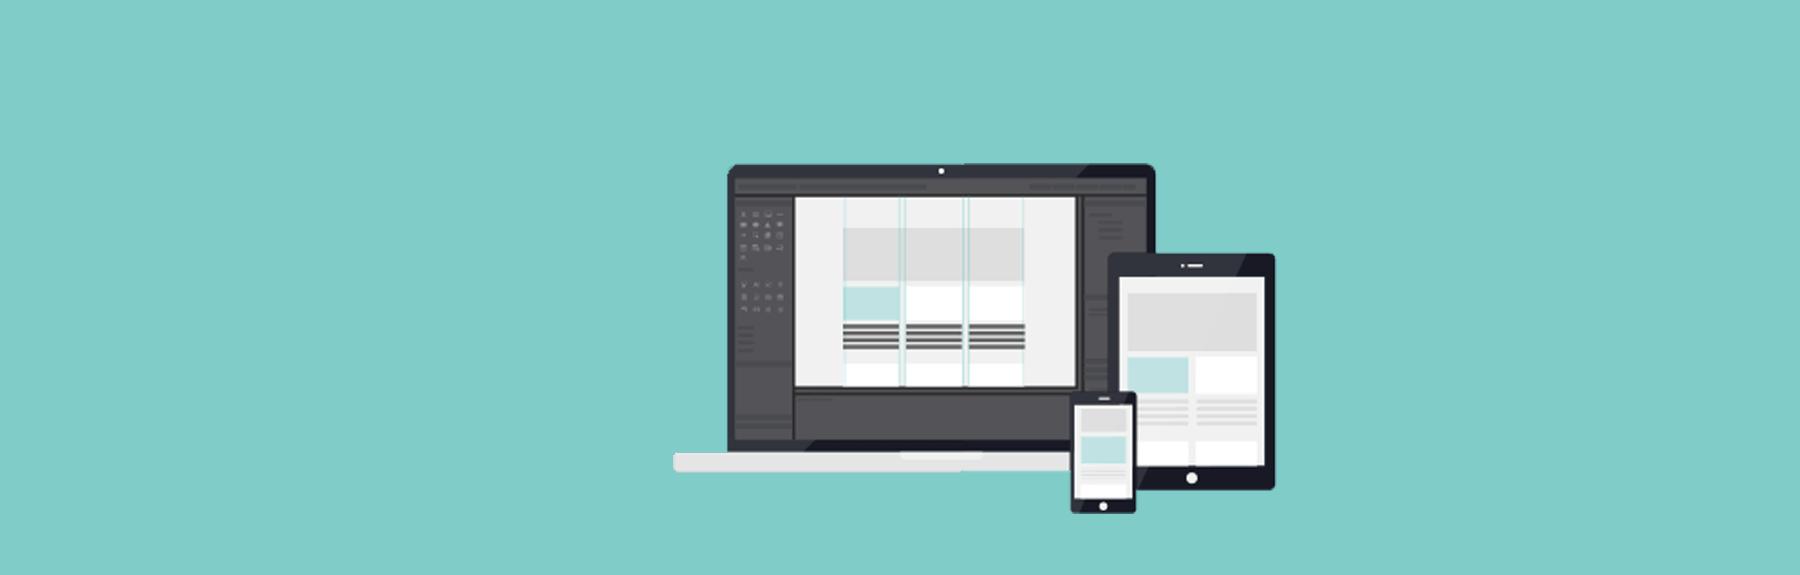 responsive-web-design-adaptive-web-design-header